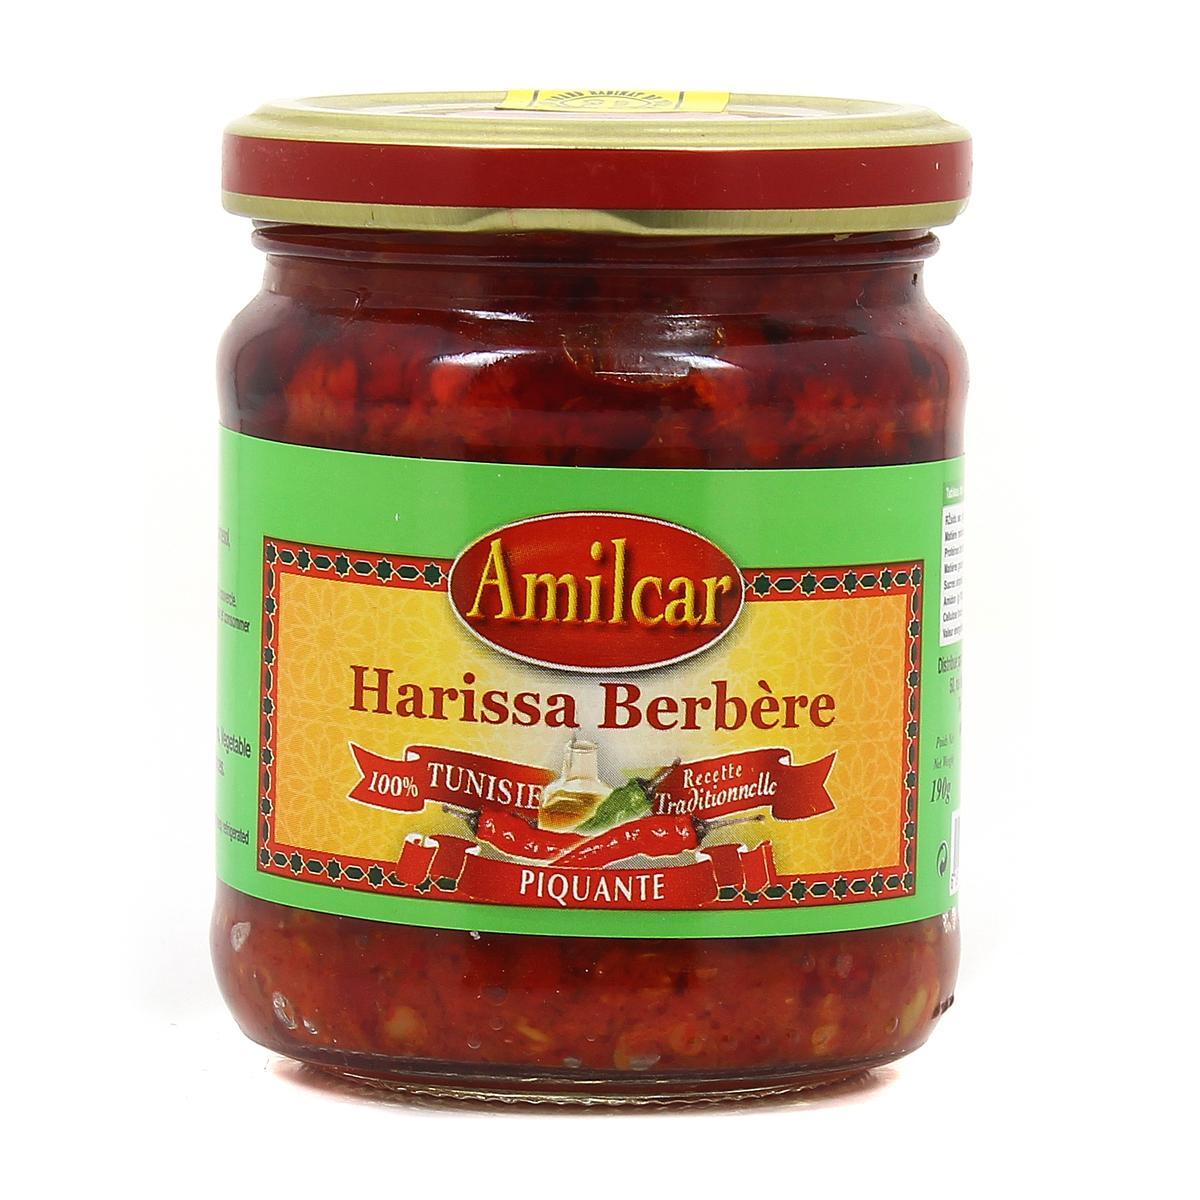 Harissa berbère, Amilcar (190 g)